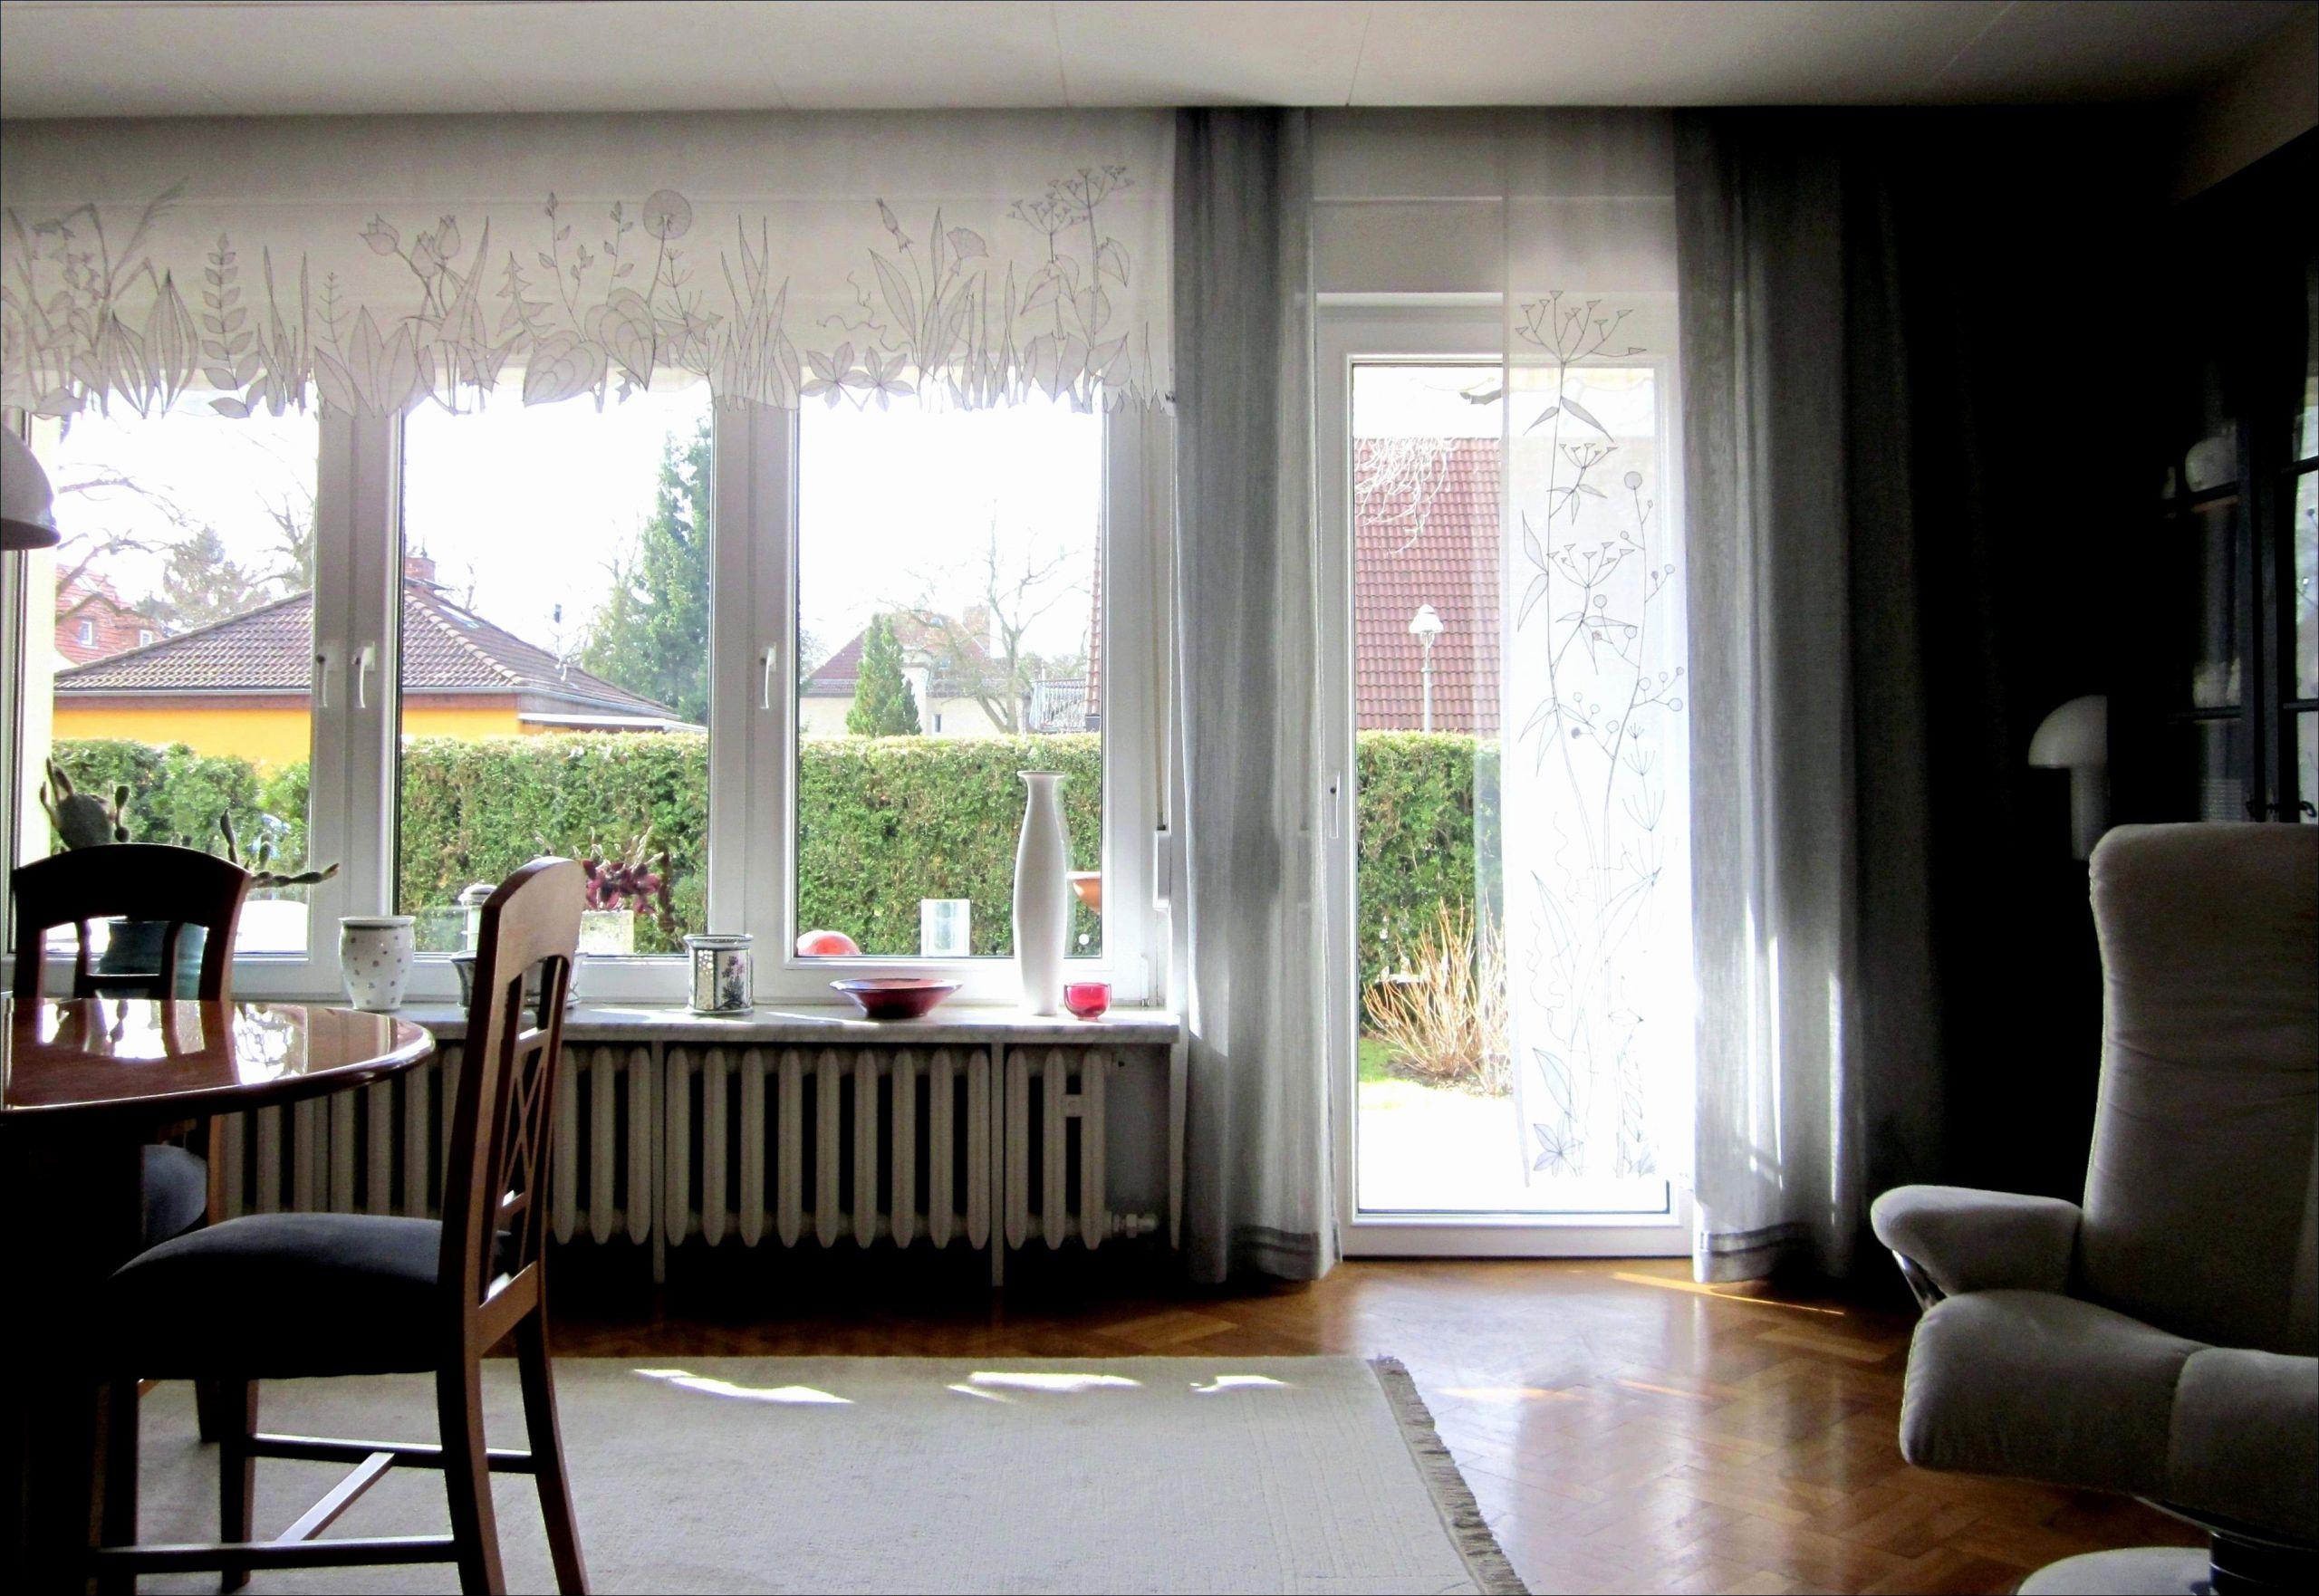 Full Size of Gardinen Wohnzimmer Kurz Modern Genial Kurze Kurzzeitmesser Küche Fenster Schlafzimmer Für Die Scheibengardinen Wohnzimmer Gardinen Kurz